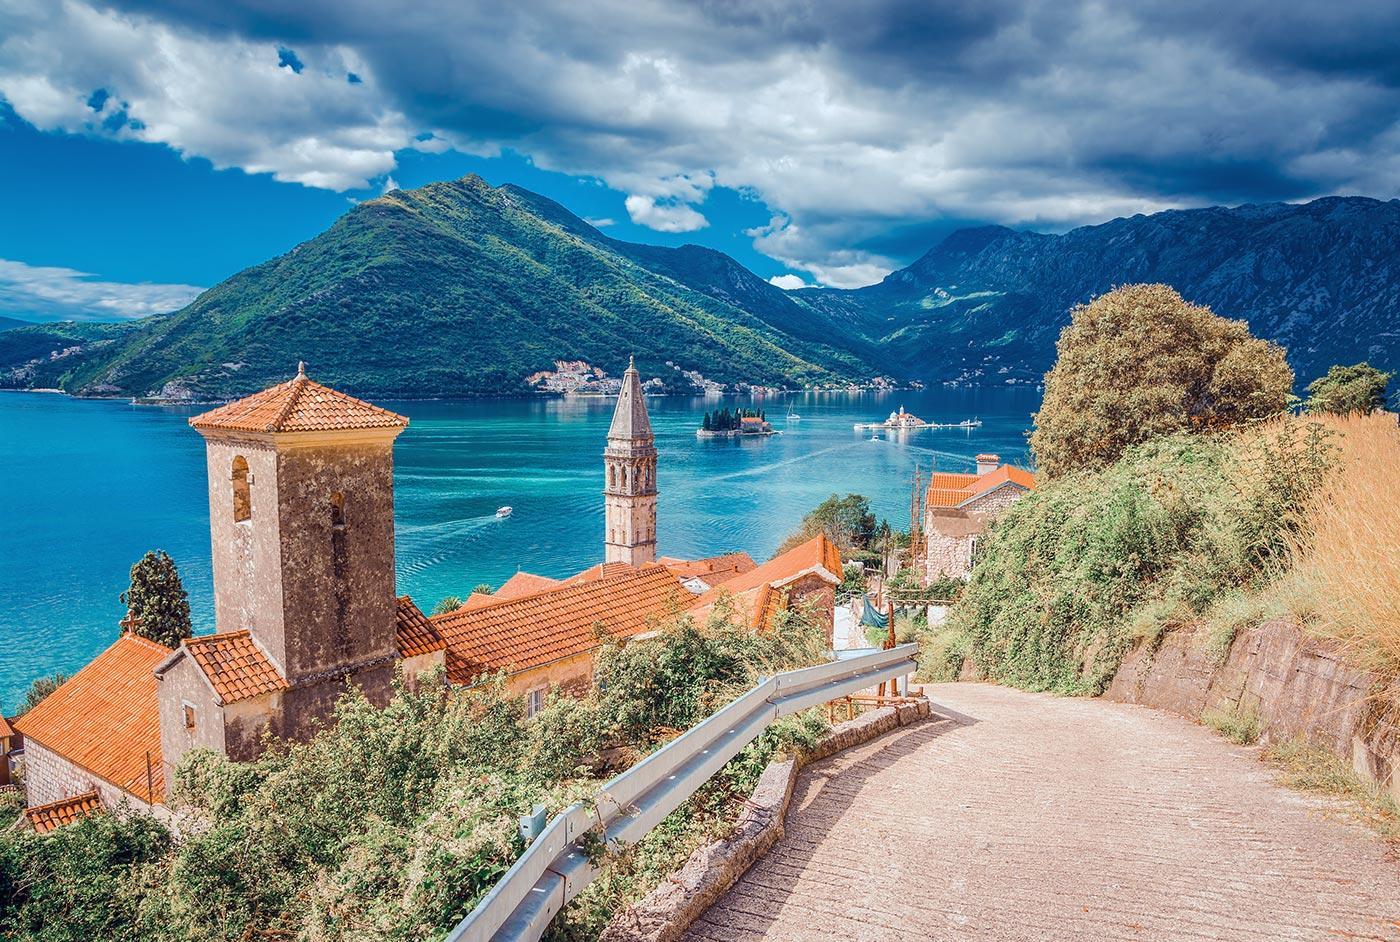 Sailing routes in Montenegro